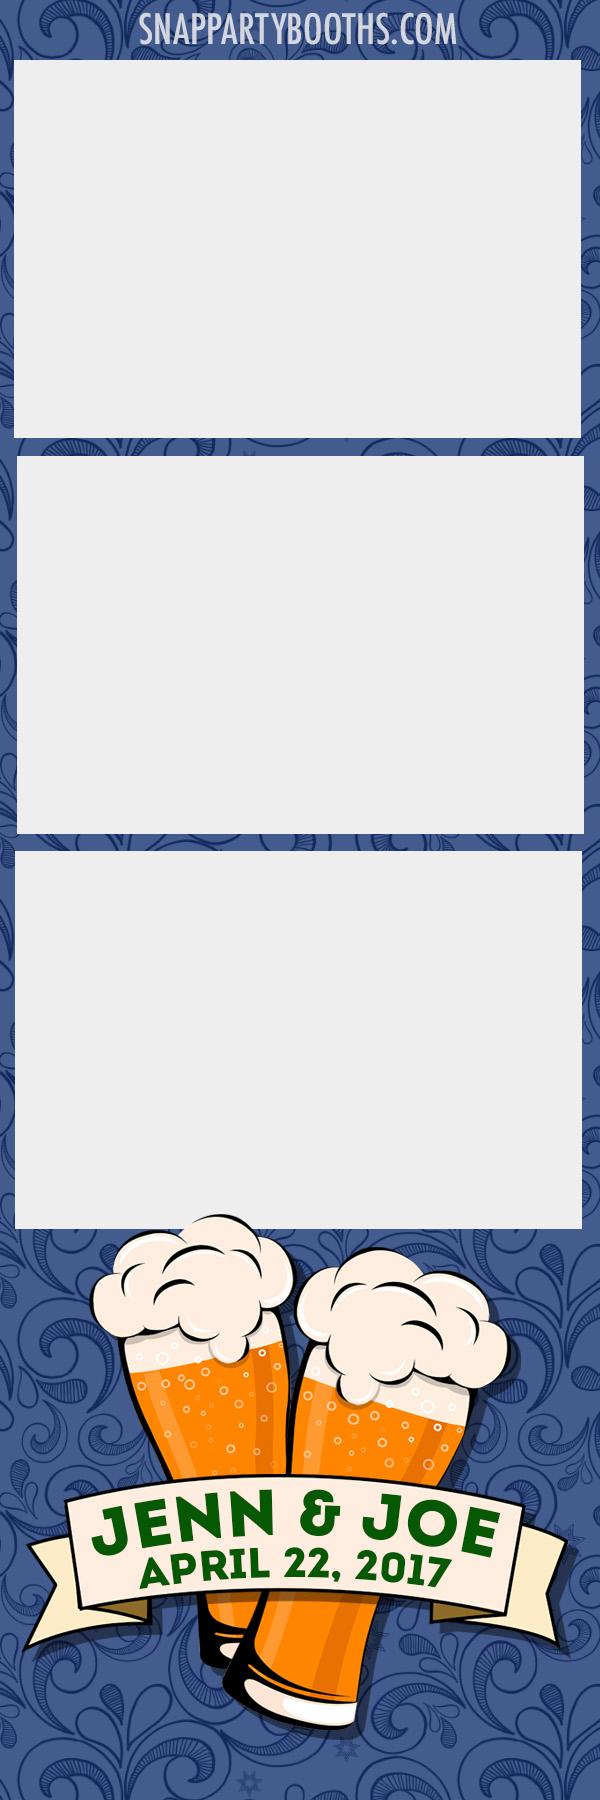 2x6-3shot-JennJoe-navy.jpg